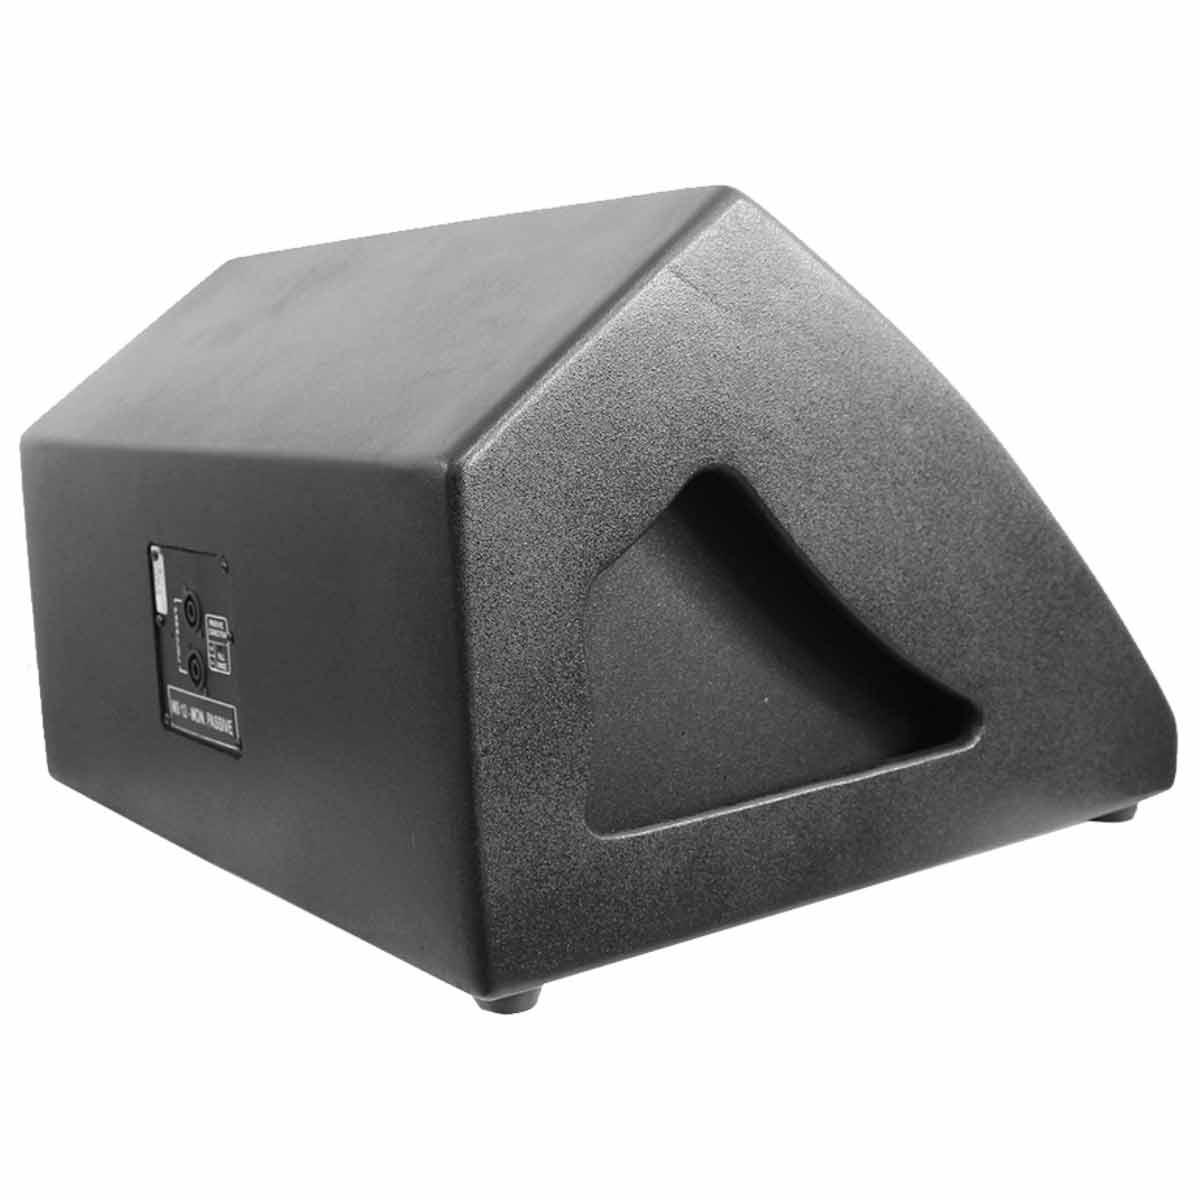 Monitor Passivo Fal 12 Pol 250W - MS 12 SoundBox